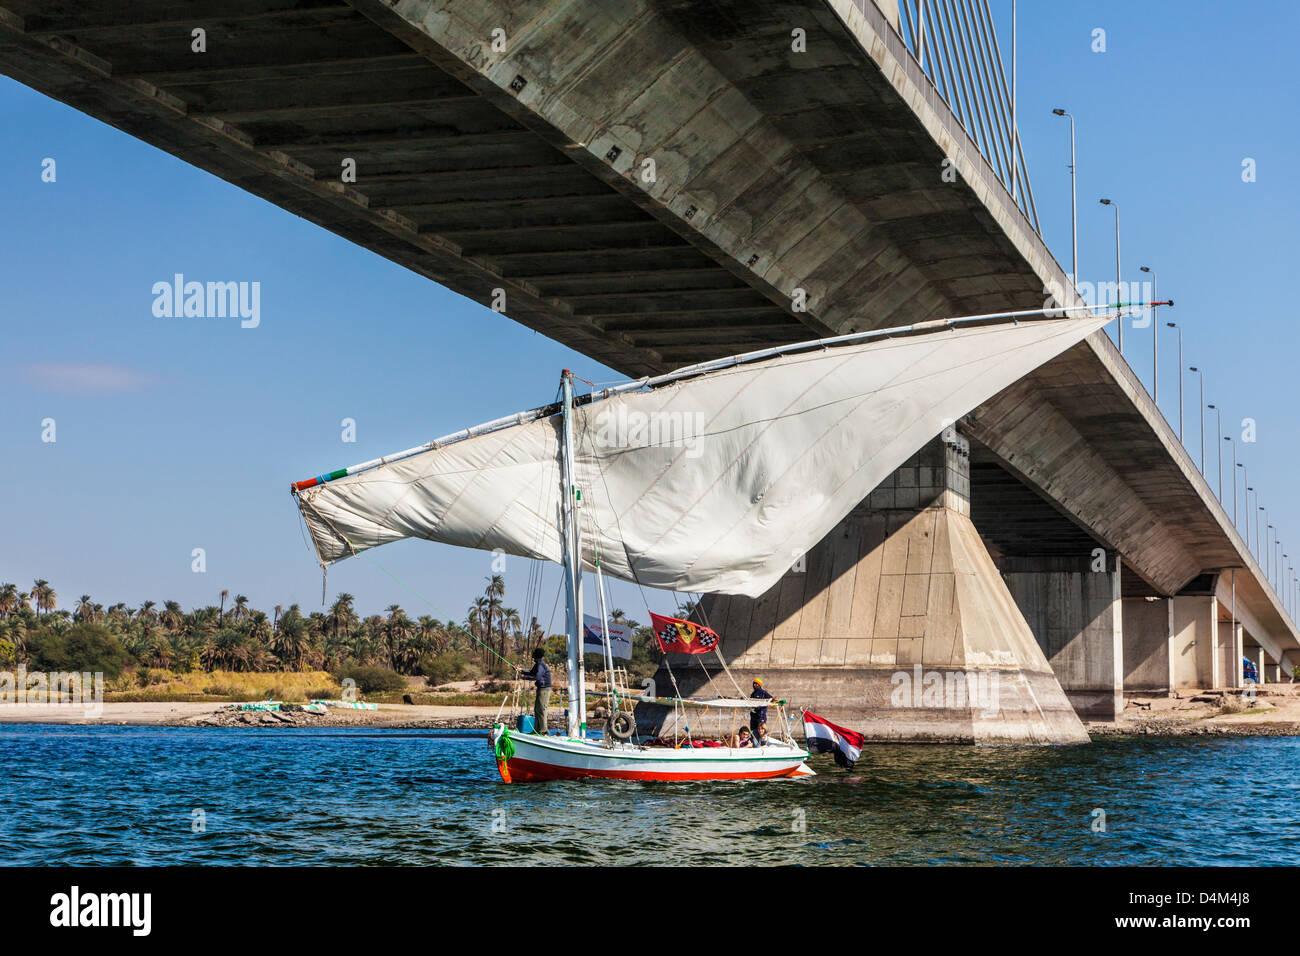 Tourist felucca swivels its main sailto pass under the bridge at Aswan on the Nile, Egypt - Stock Image